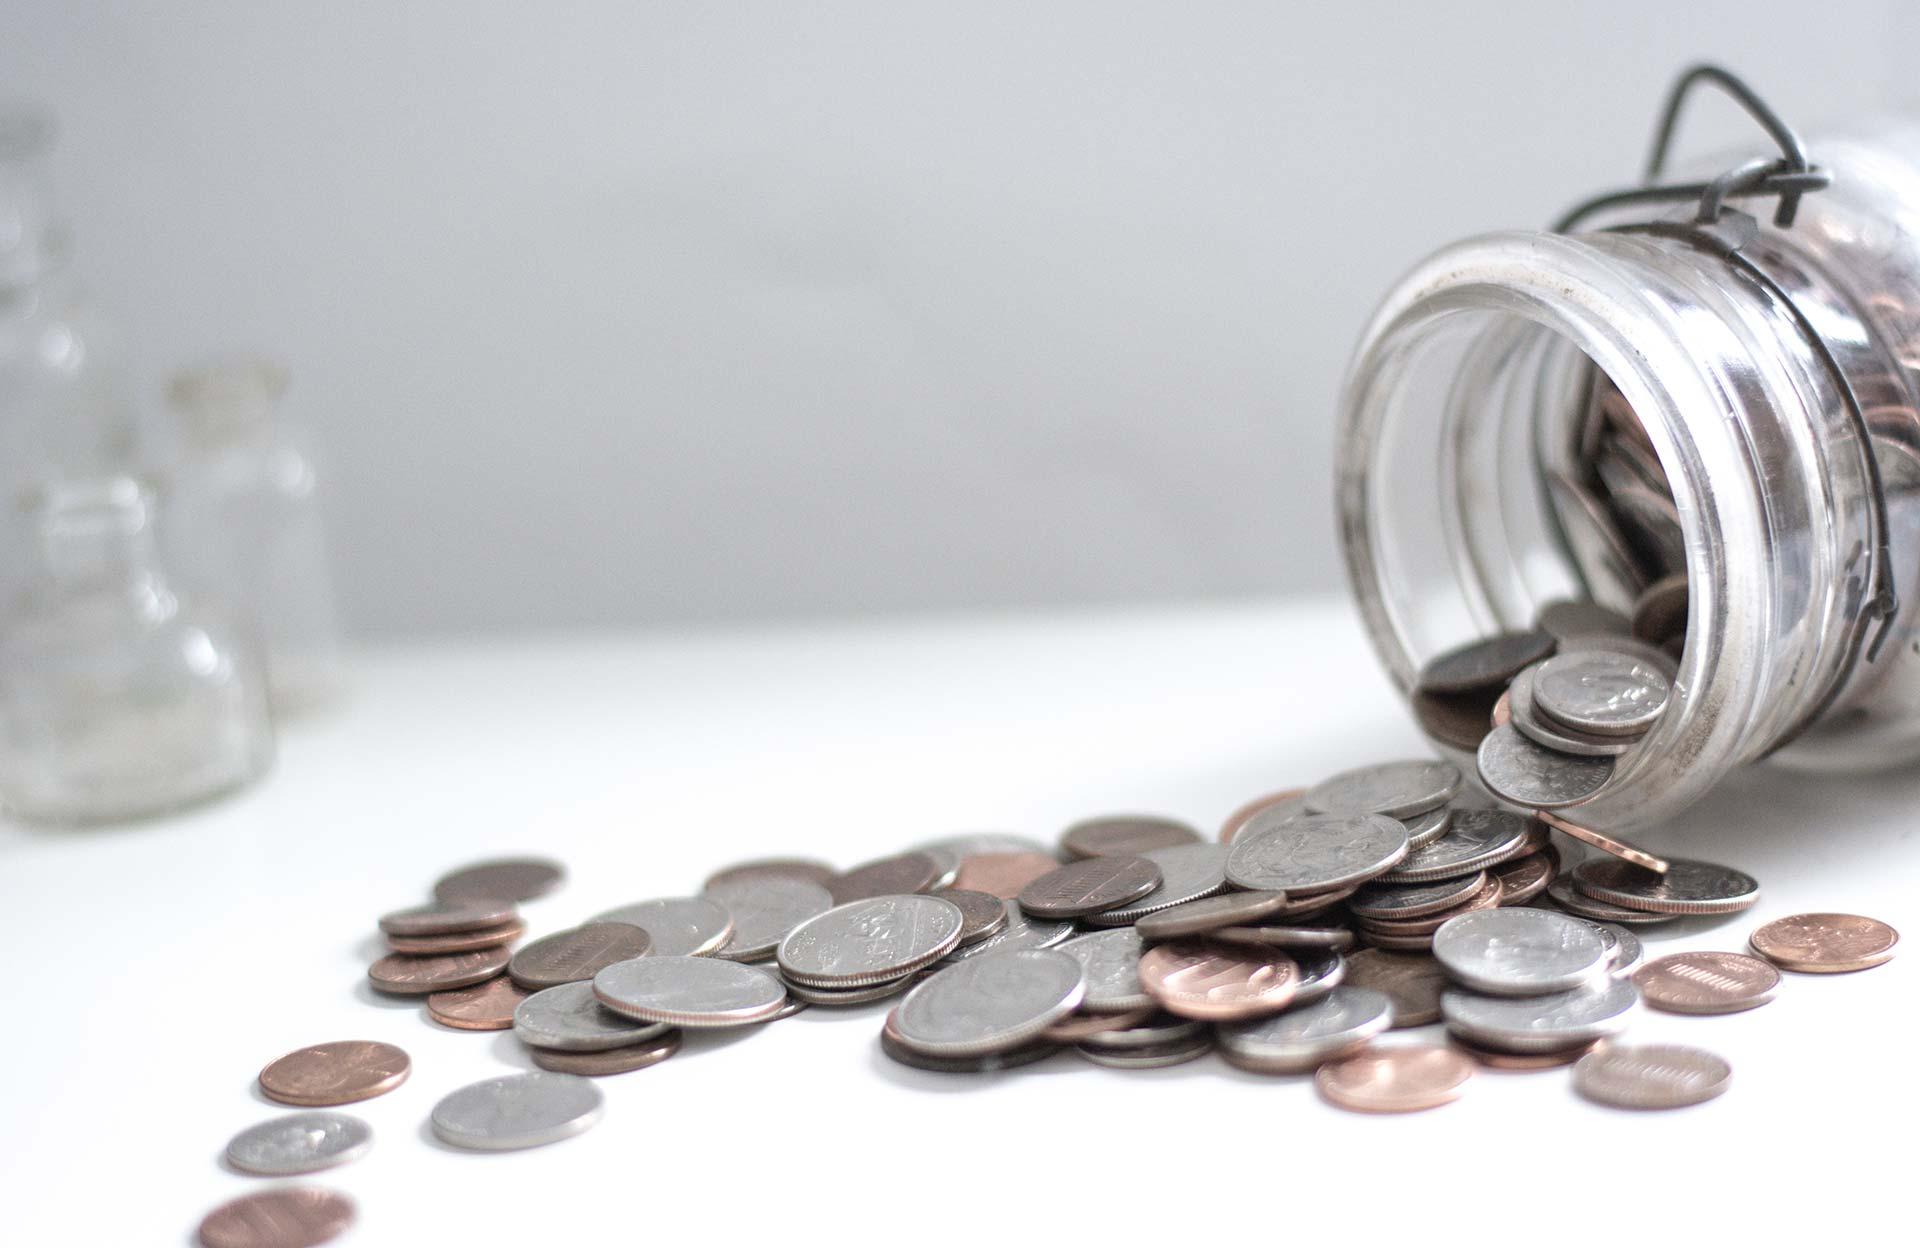 mason jar & coins